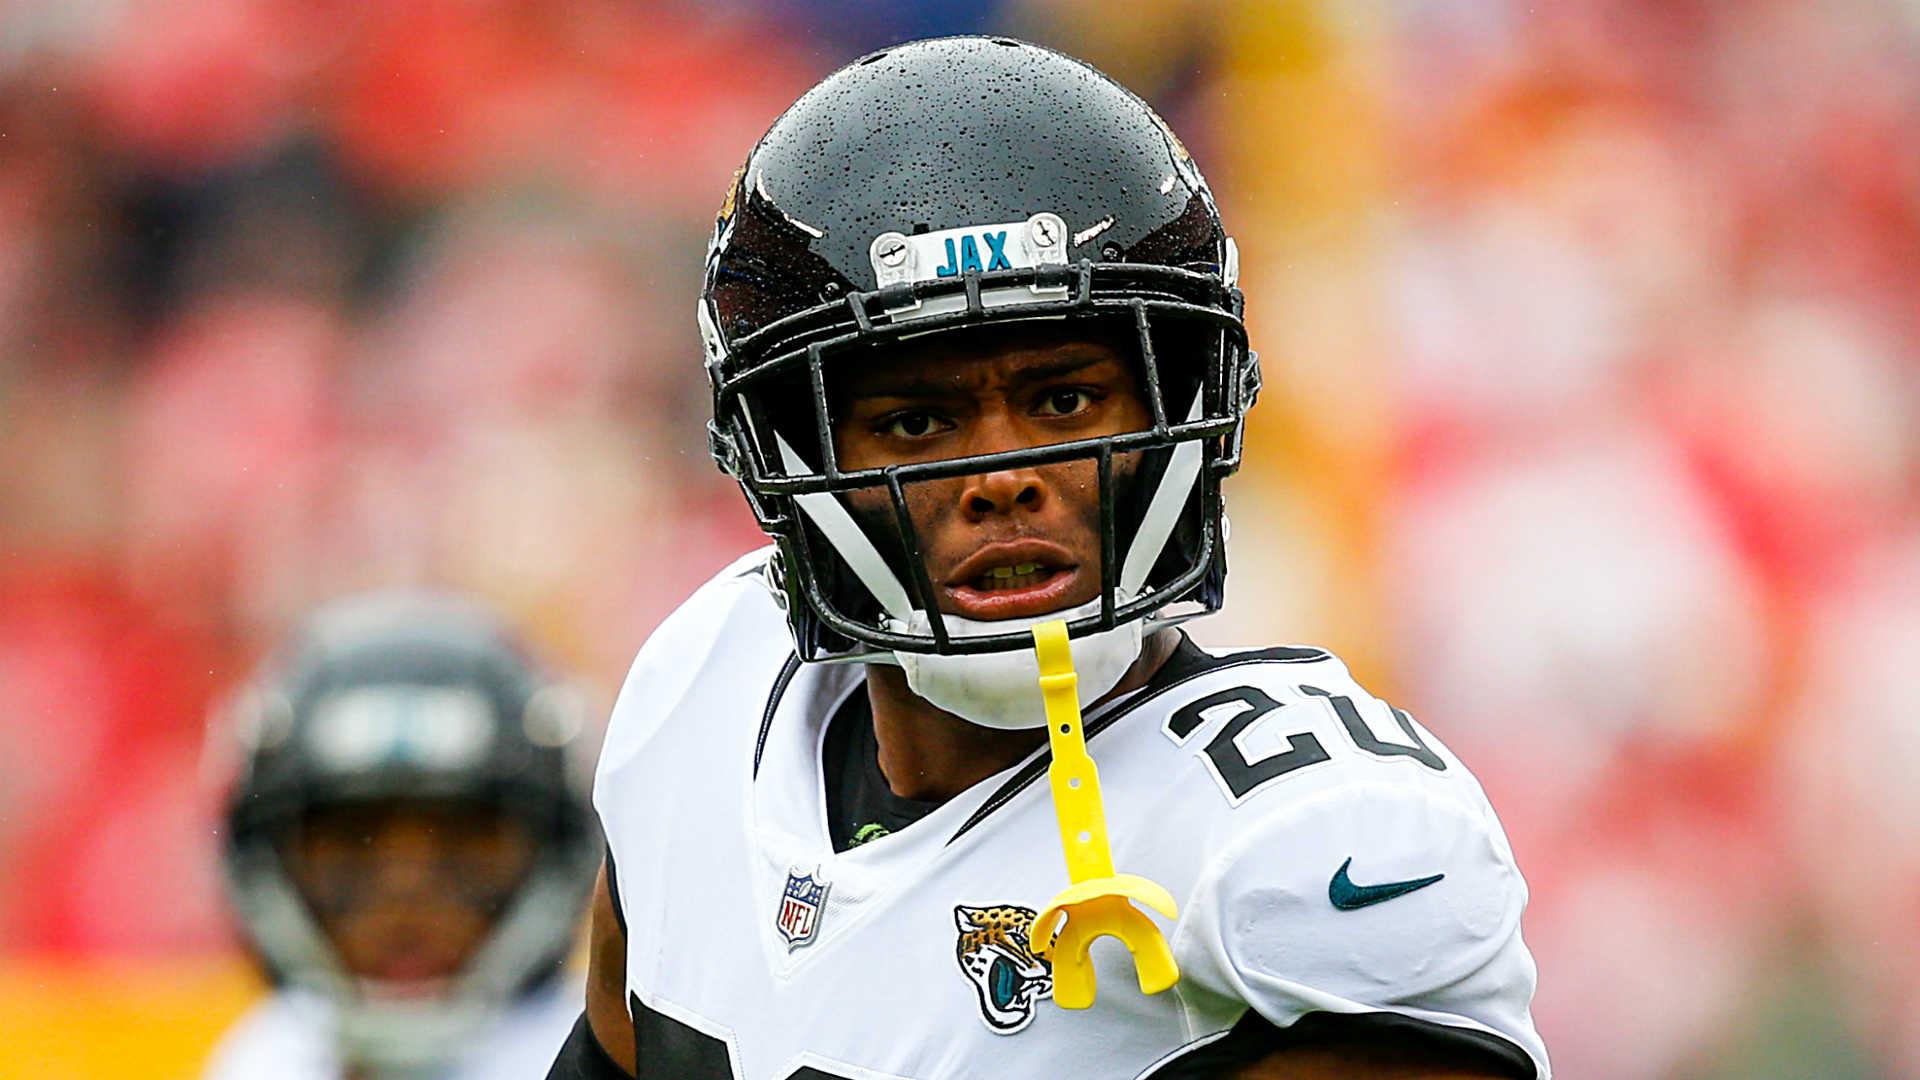 Jalen Ramsey trade rumors: Eagles, Chiefs best need-fit landing spots for Jaguars CB